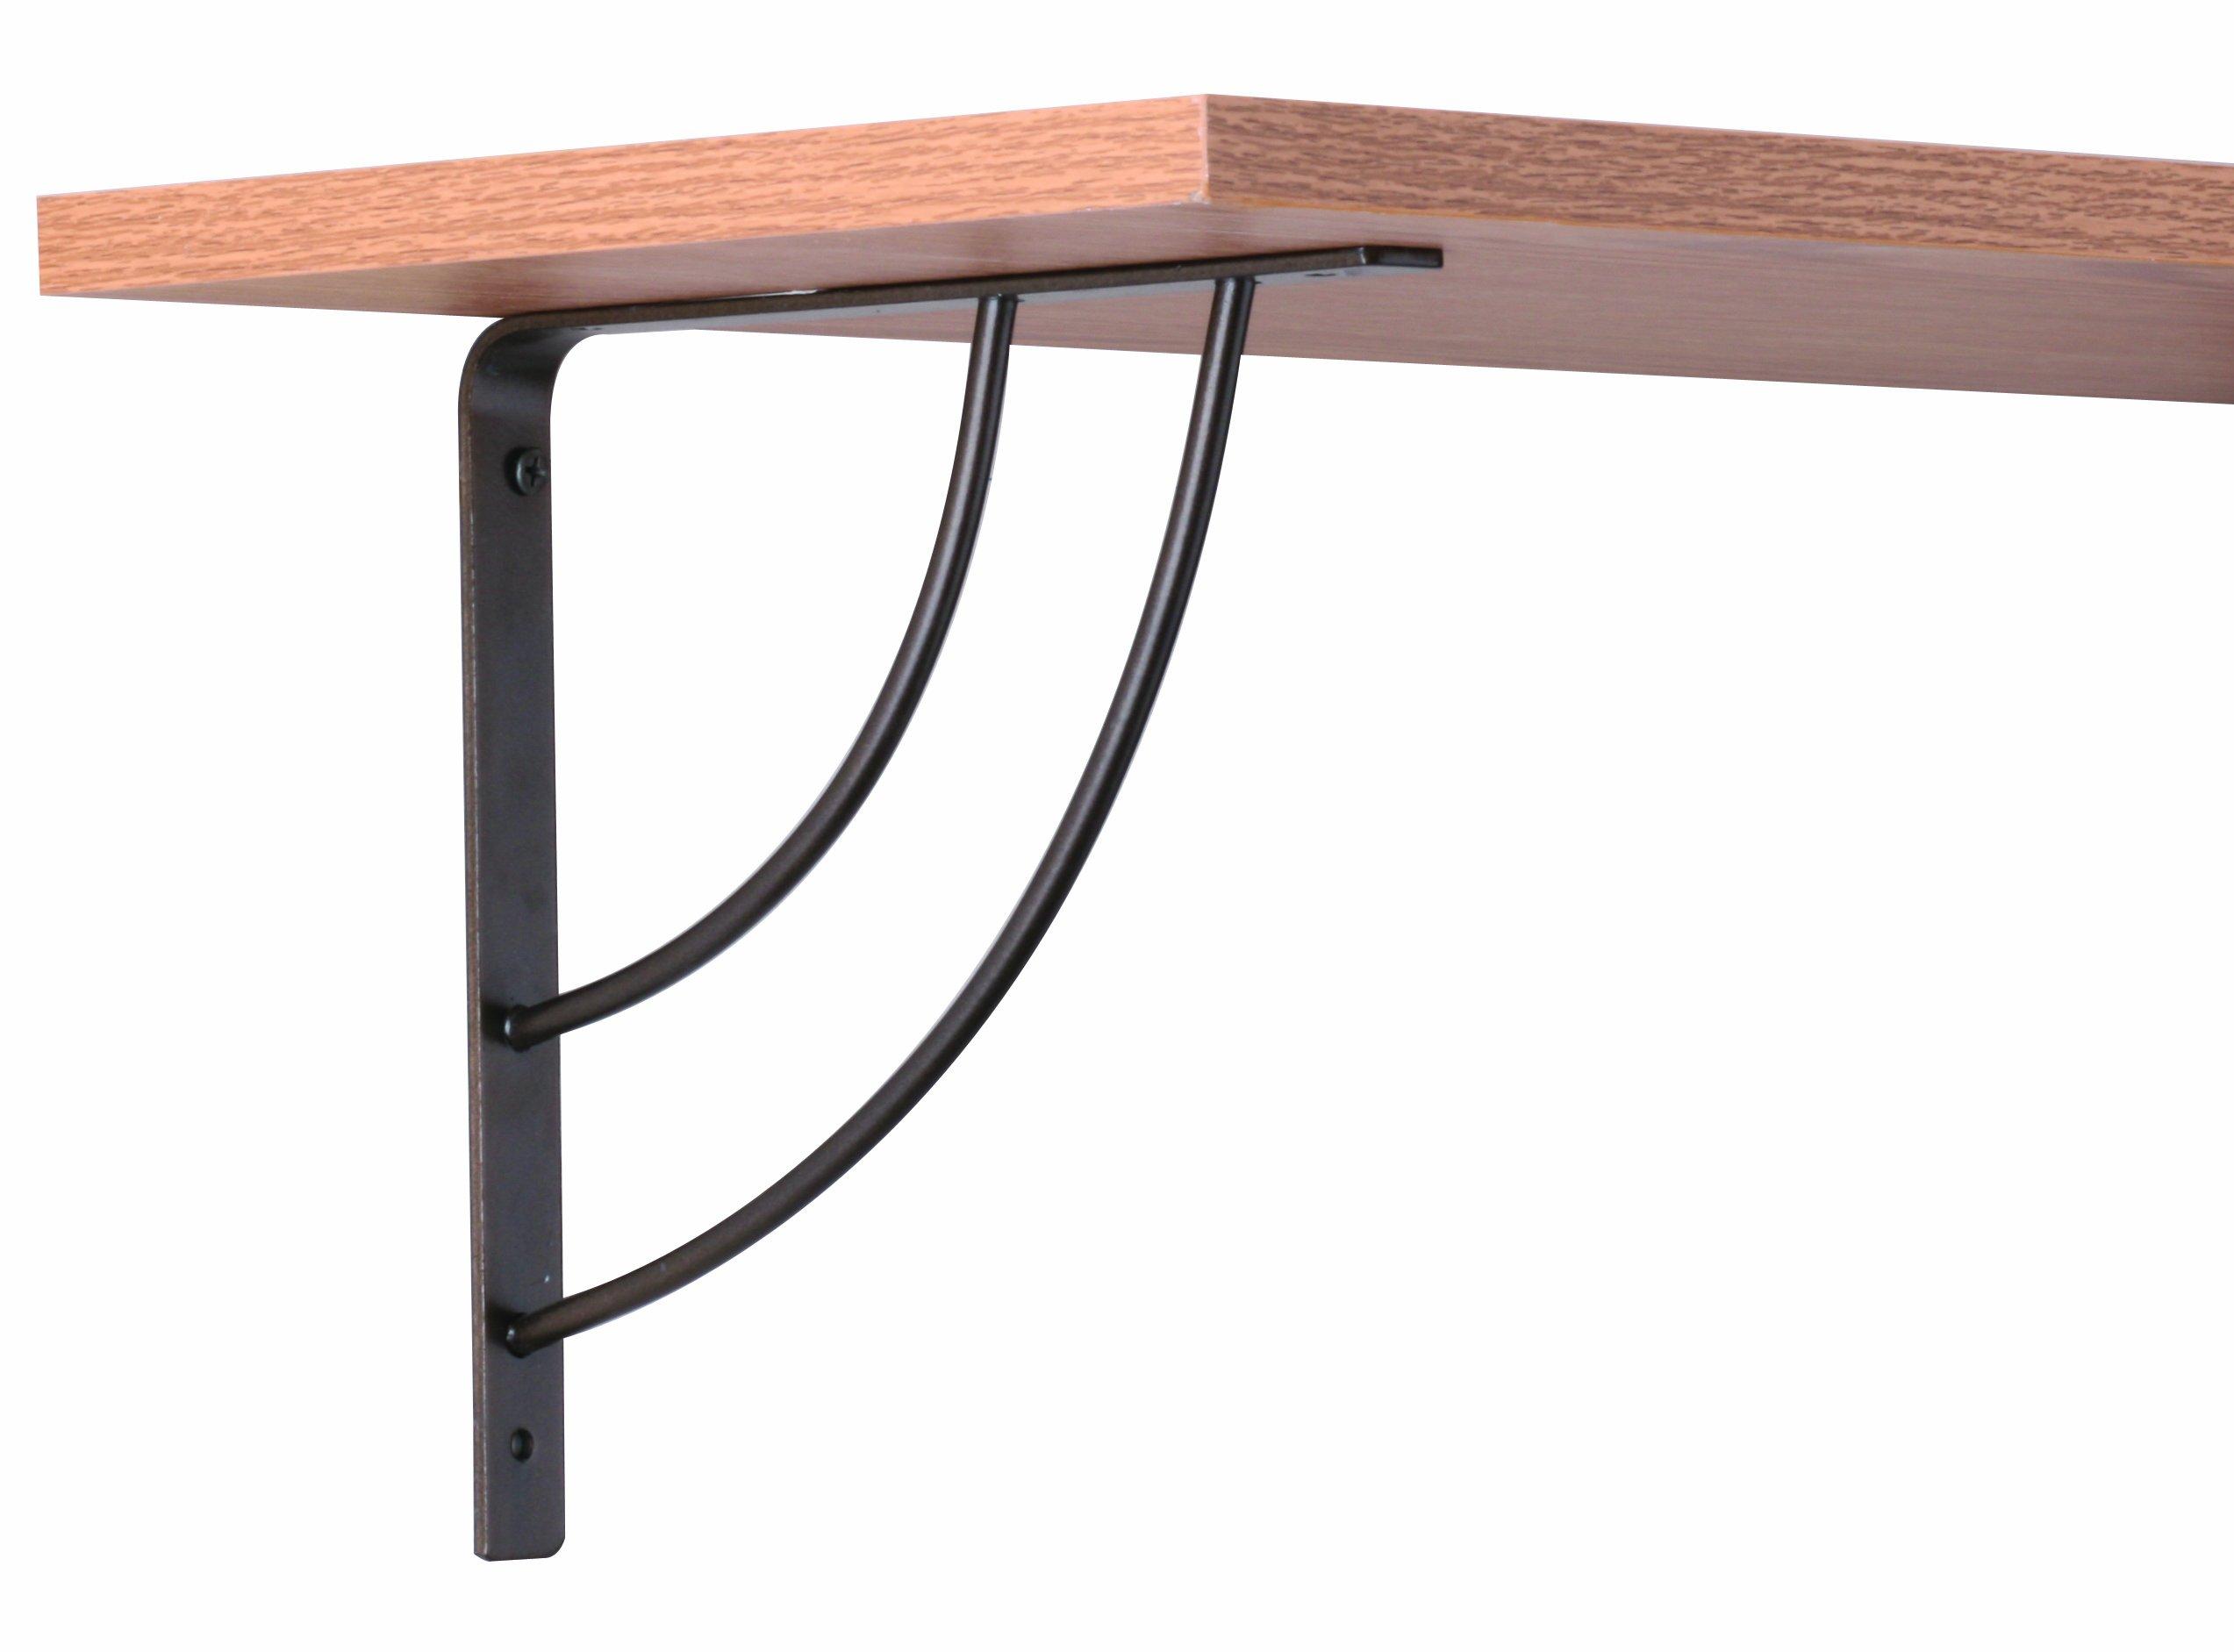 John Sterling Milano Style Decorative Shelf Bracket, 8-inch, Bronze, RP-0087-8BRZ by John Sterling